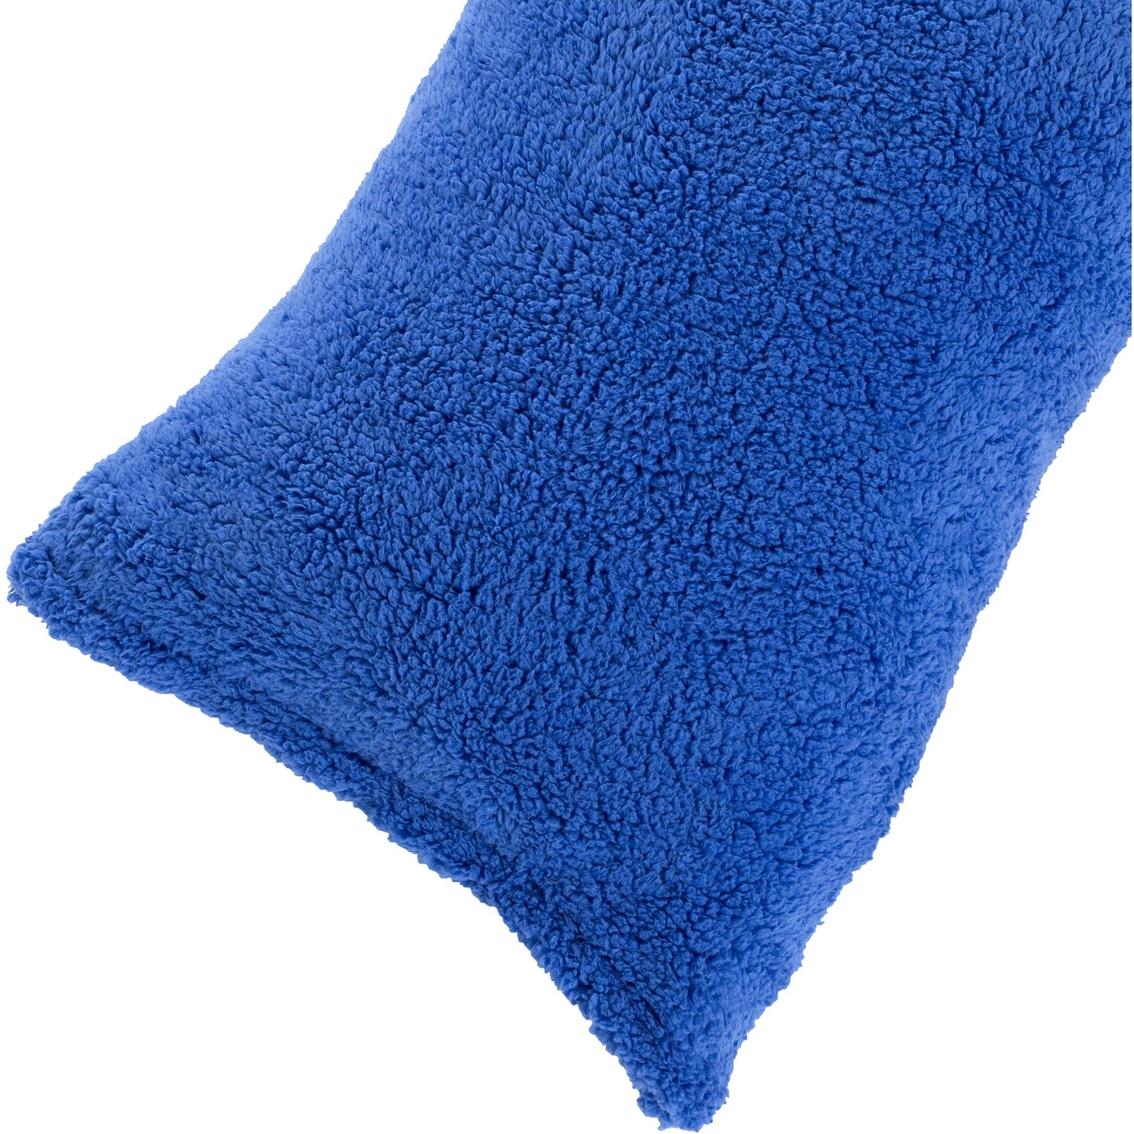 Sherpa Body Pillow Cover.Lavish Home Sherpa Body Pillow Cover Pillowcases Home